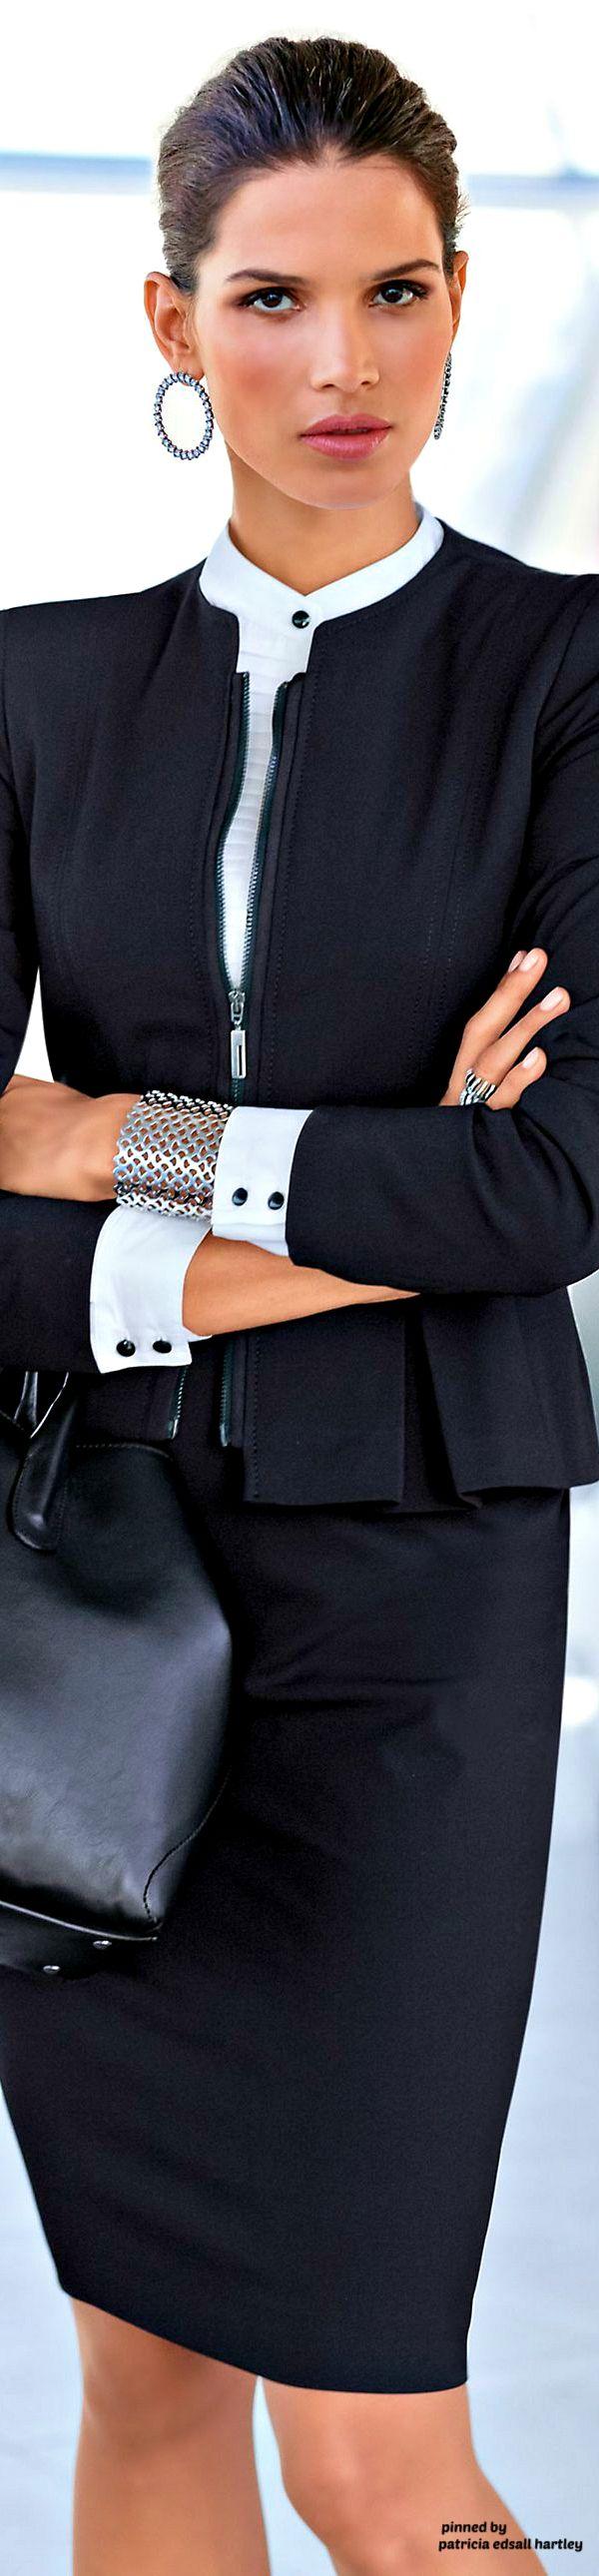 Rosamaria G Frangini | High Office Fashion | Madeleine Fashion